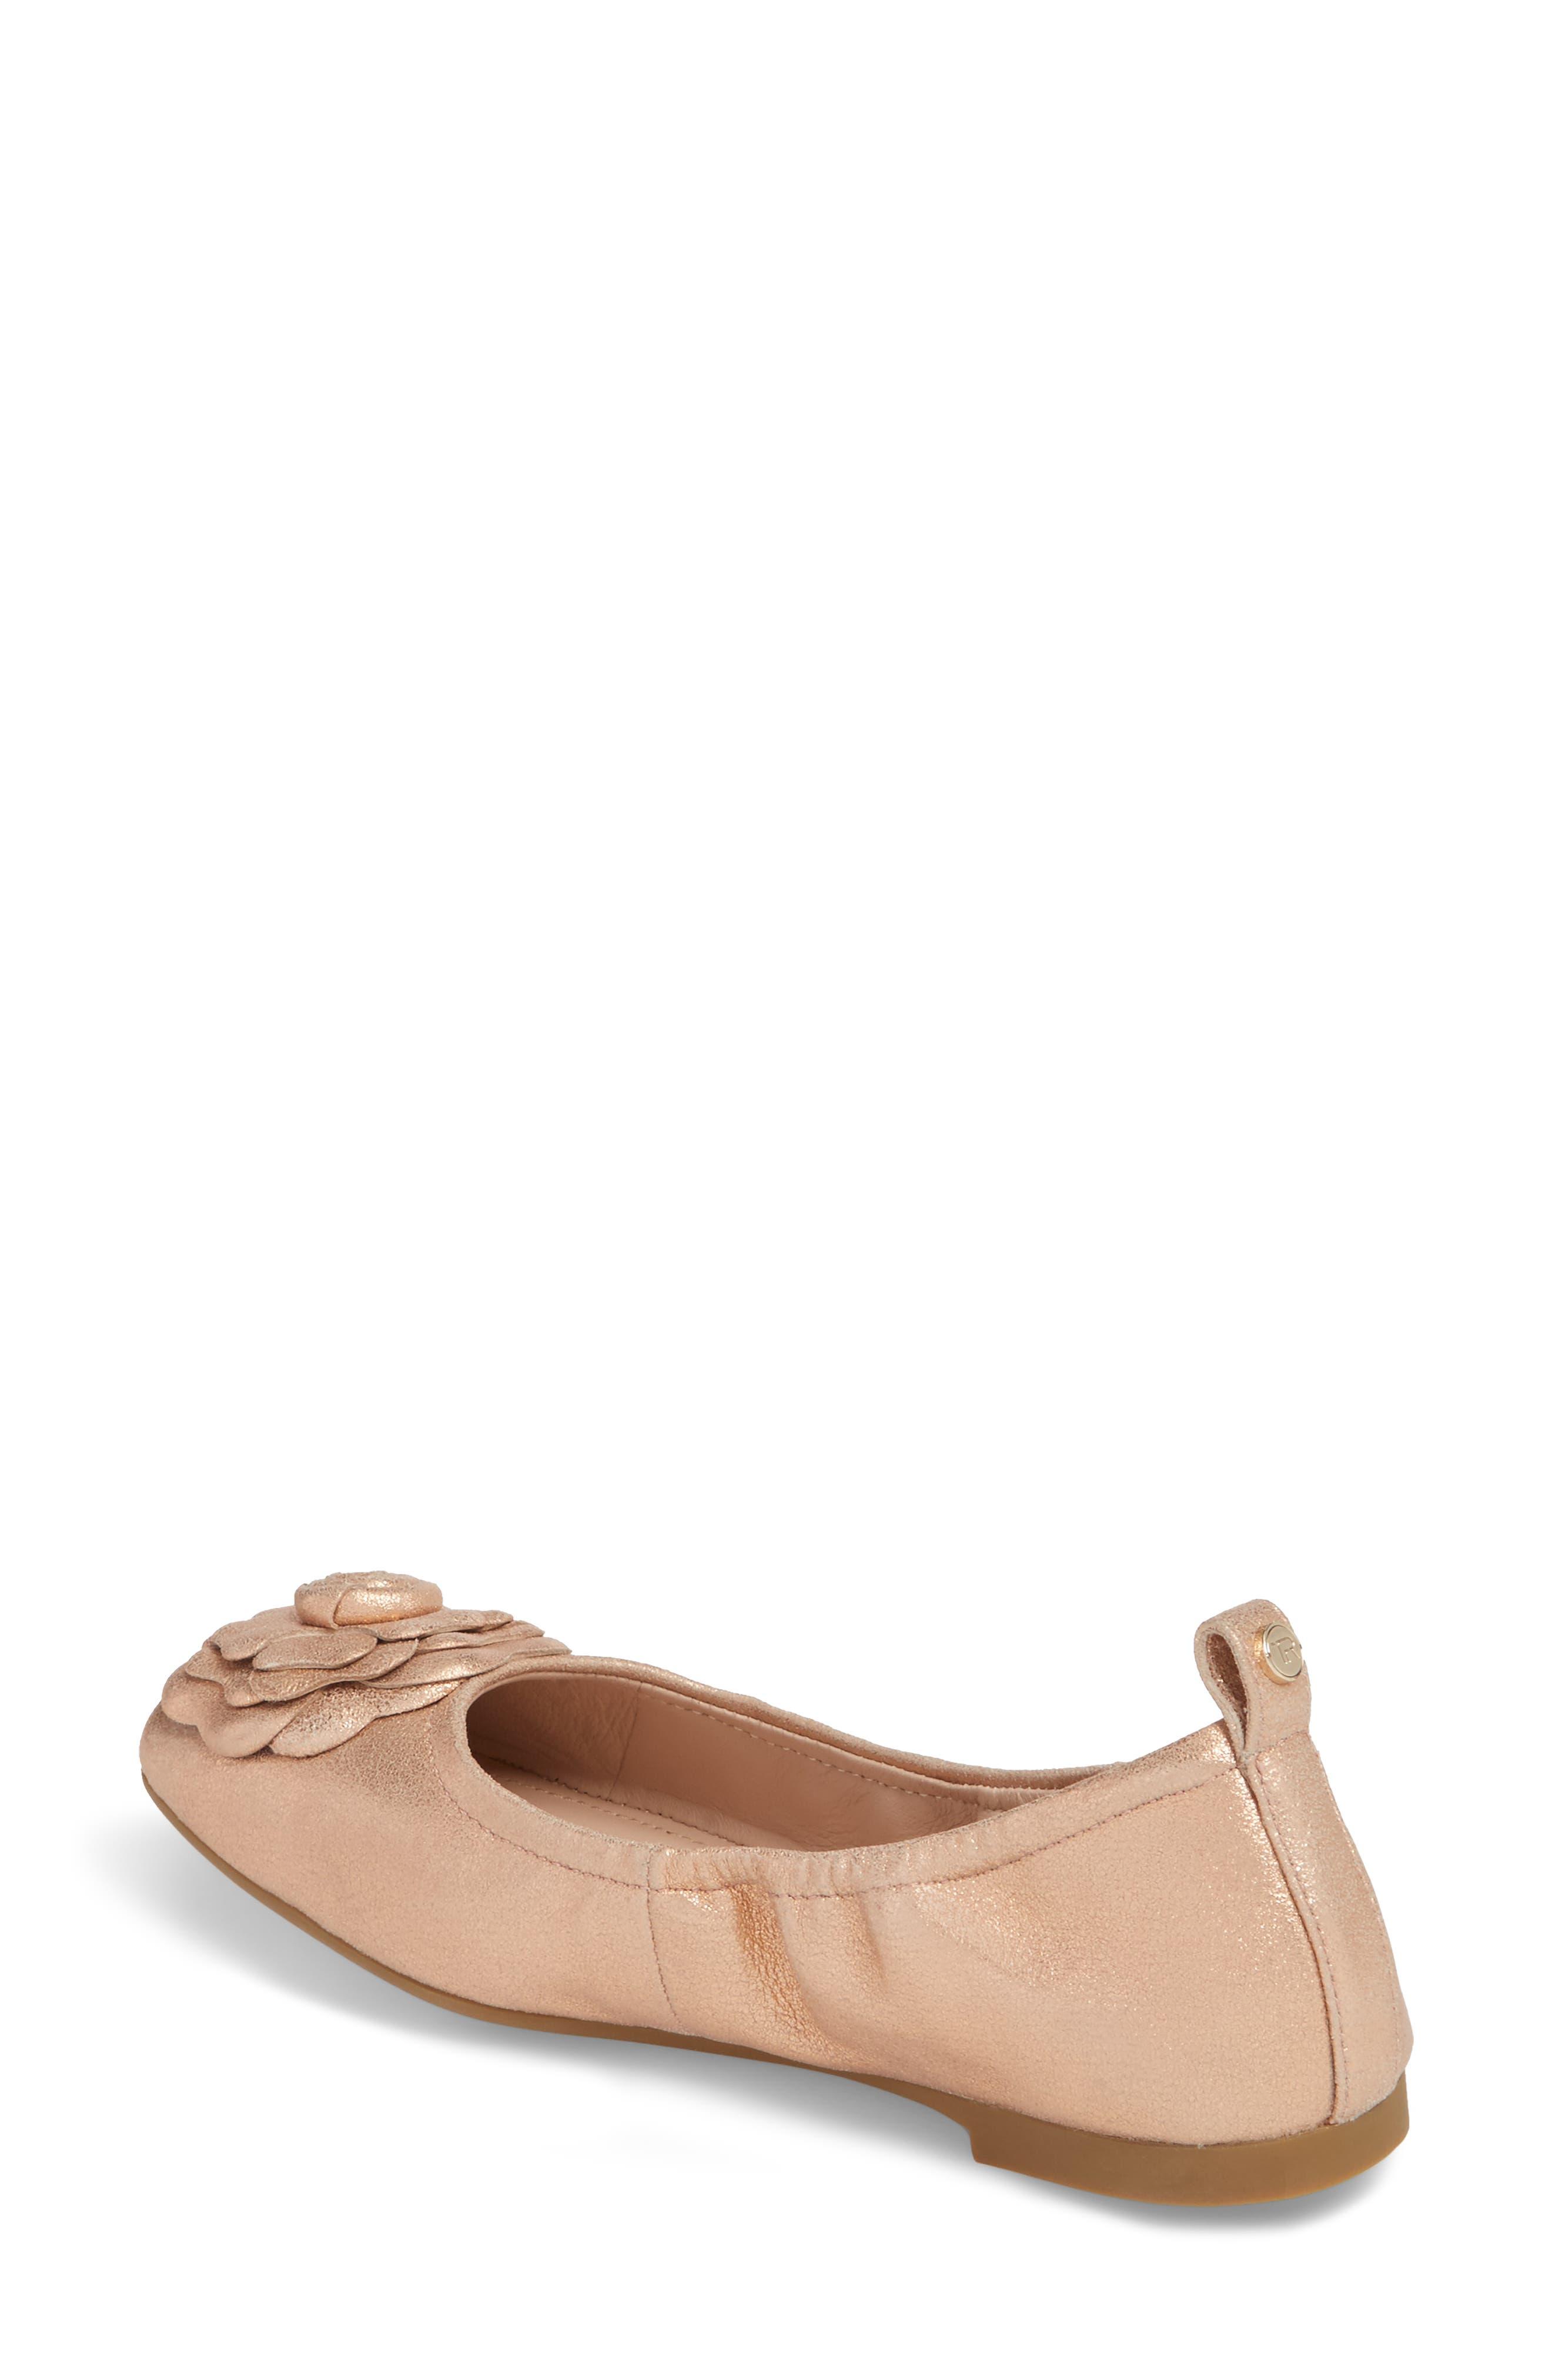 Rosalyn Ballet Flat,                             Alternate thumbnail 2, color,                             Rose Gold Leather